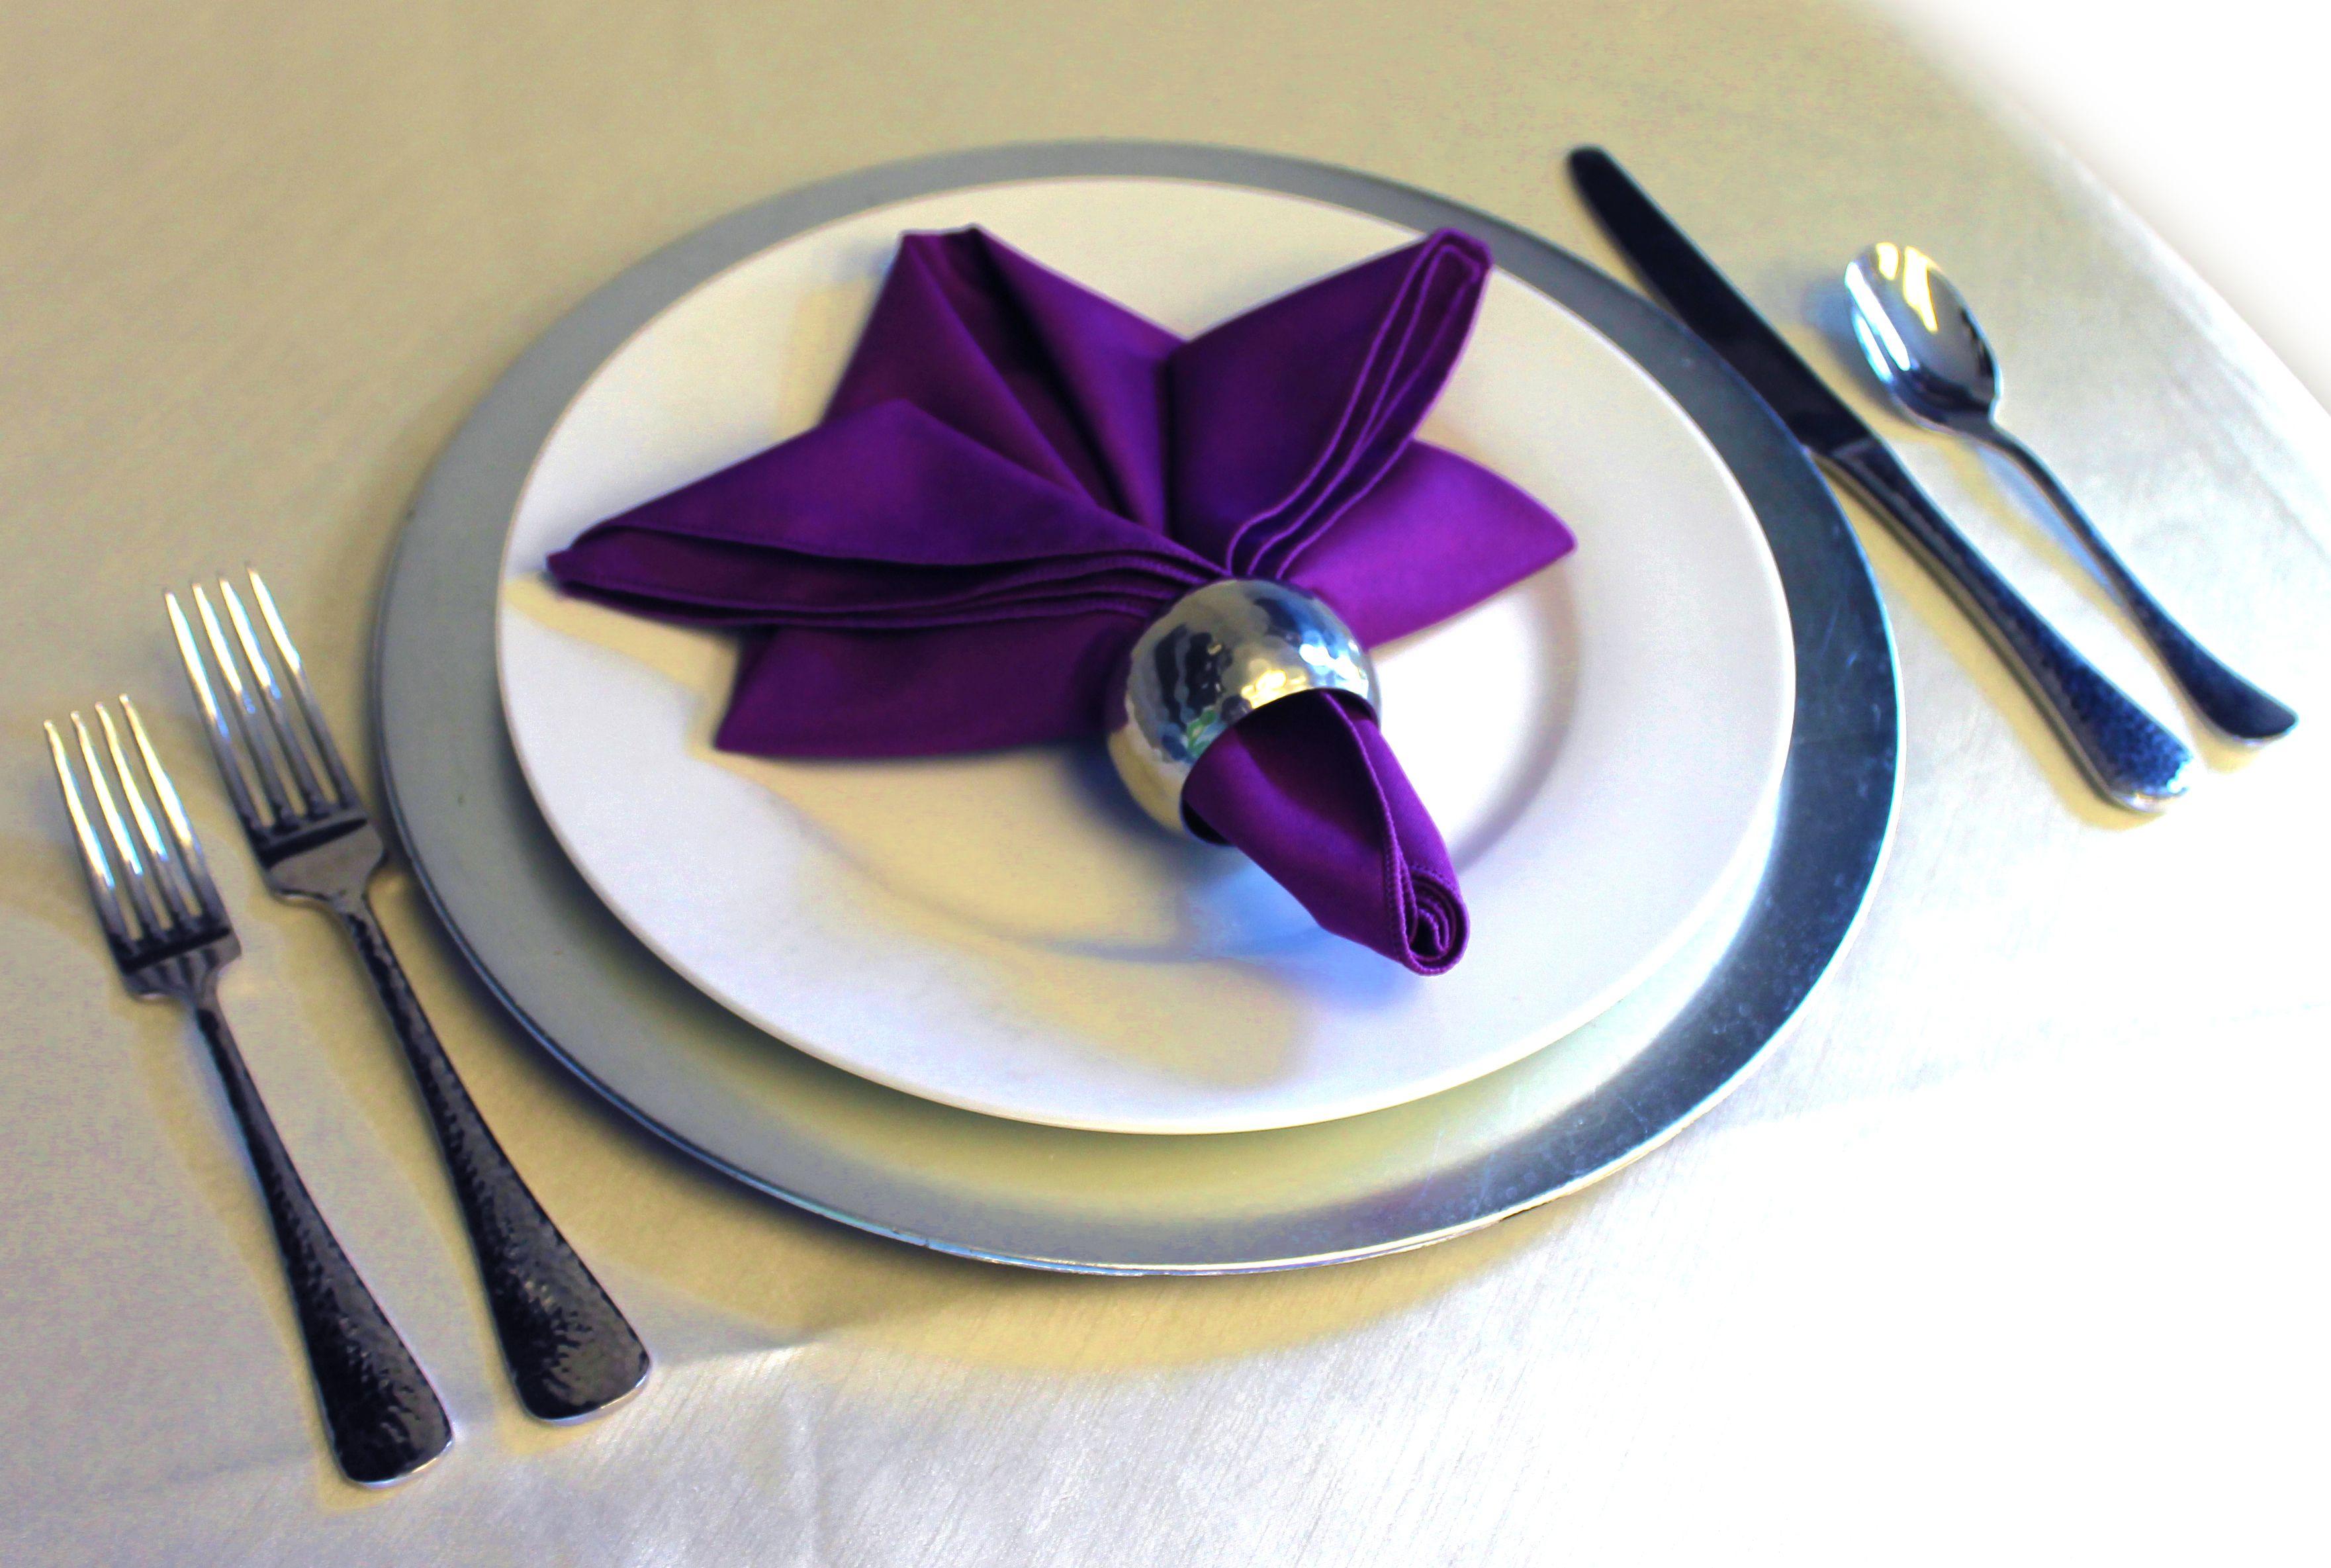 Fleur De Lis Napkin Fold with Napkin Ring  sc 1 st  Pinterest & Fleur De Lis Napkin Fold with Napkin Ring | Wedding Ideas ...